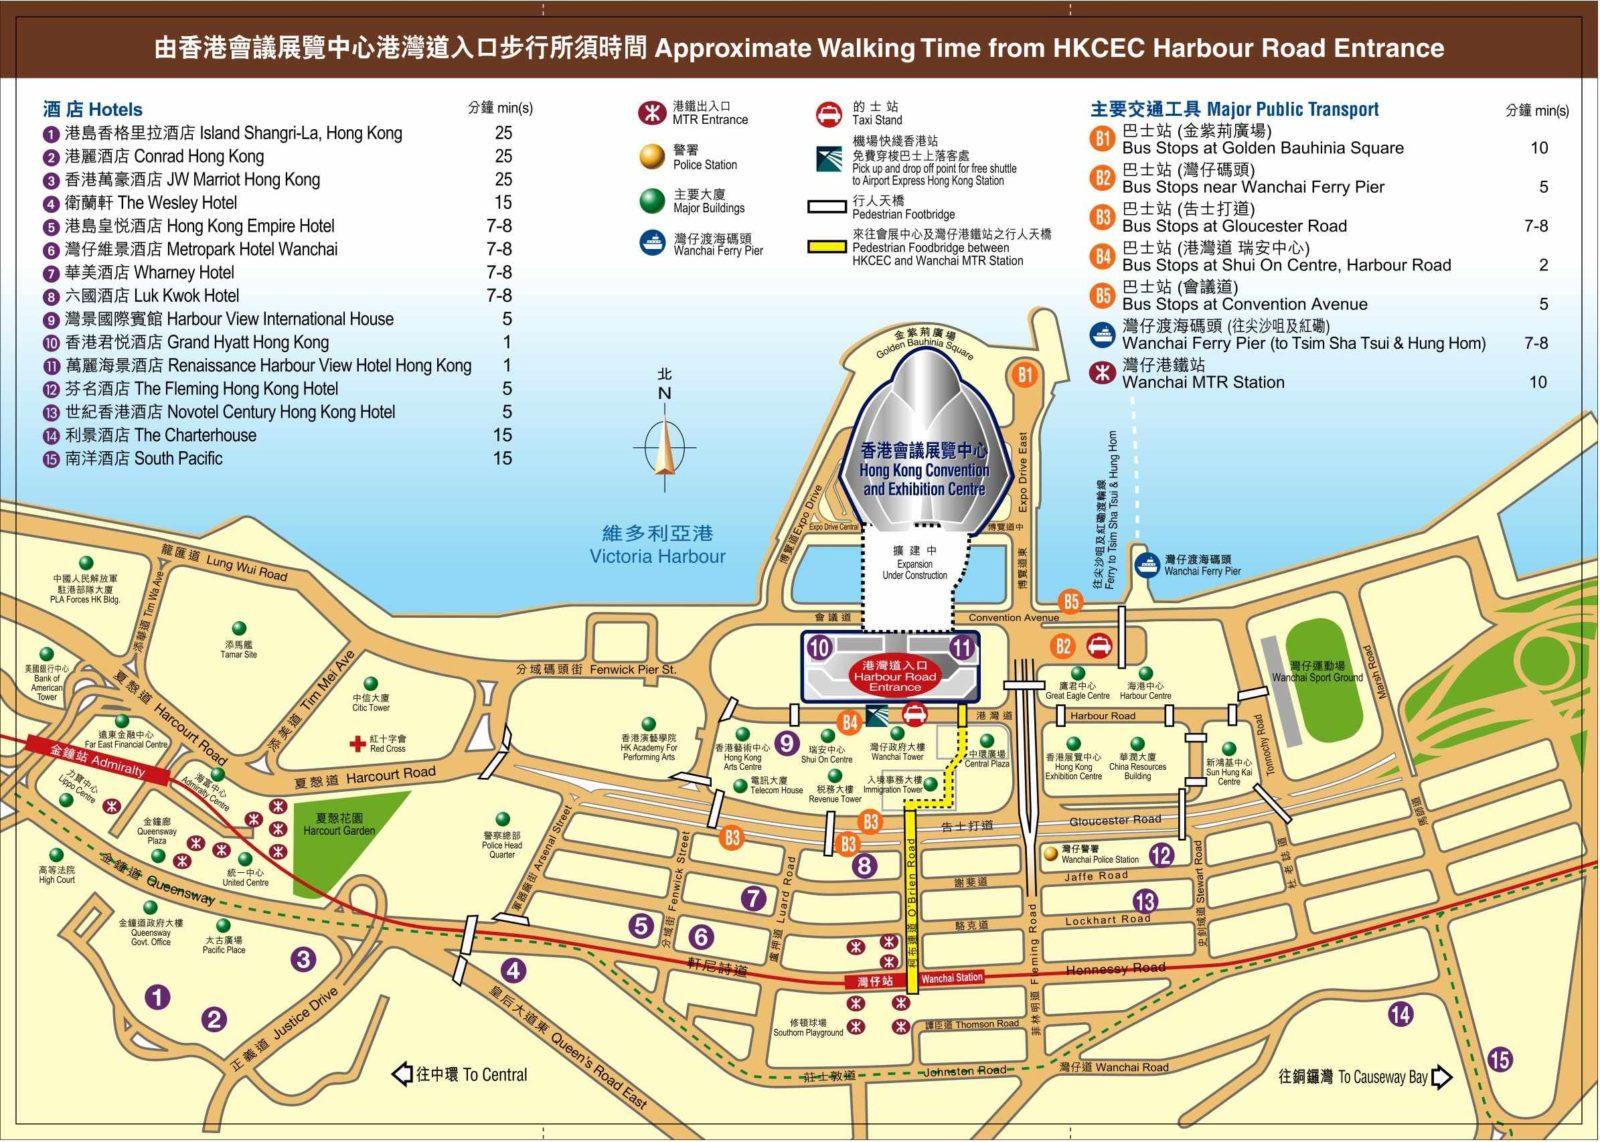 Hong Kong Convention Amp Exhibition Center Hkcec Map